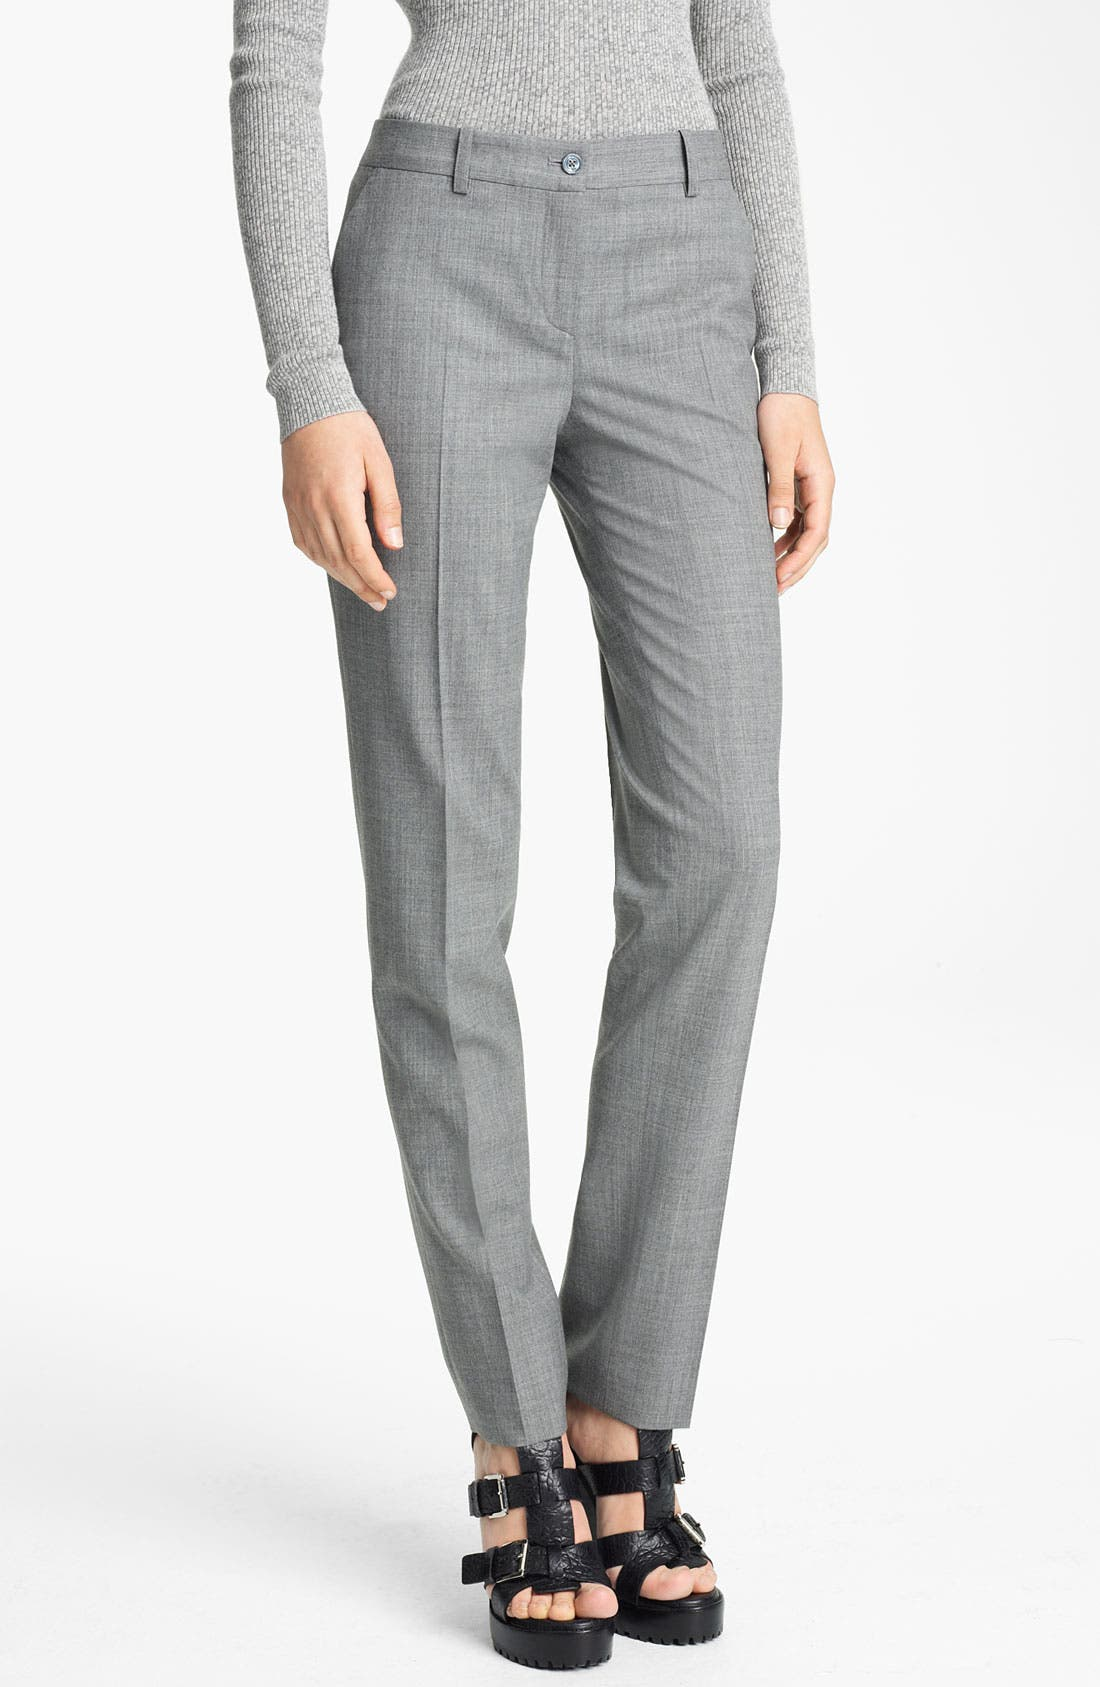 Alternate Image 1 Selected - Michael Kors 'Samantha' Skinny Tropical Wool Pants